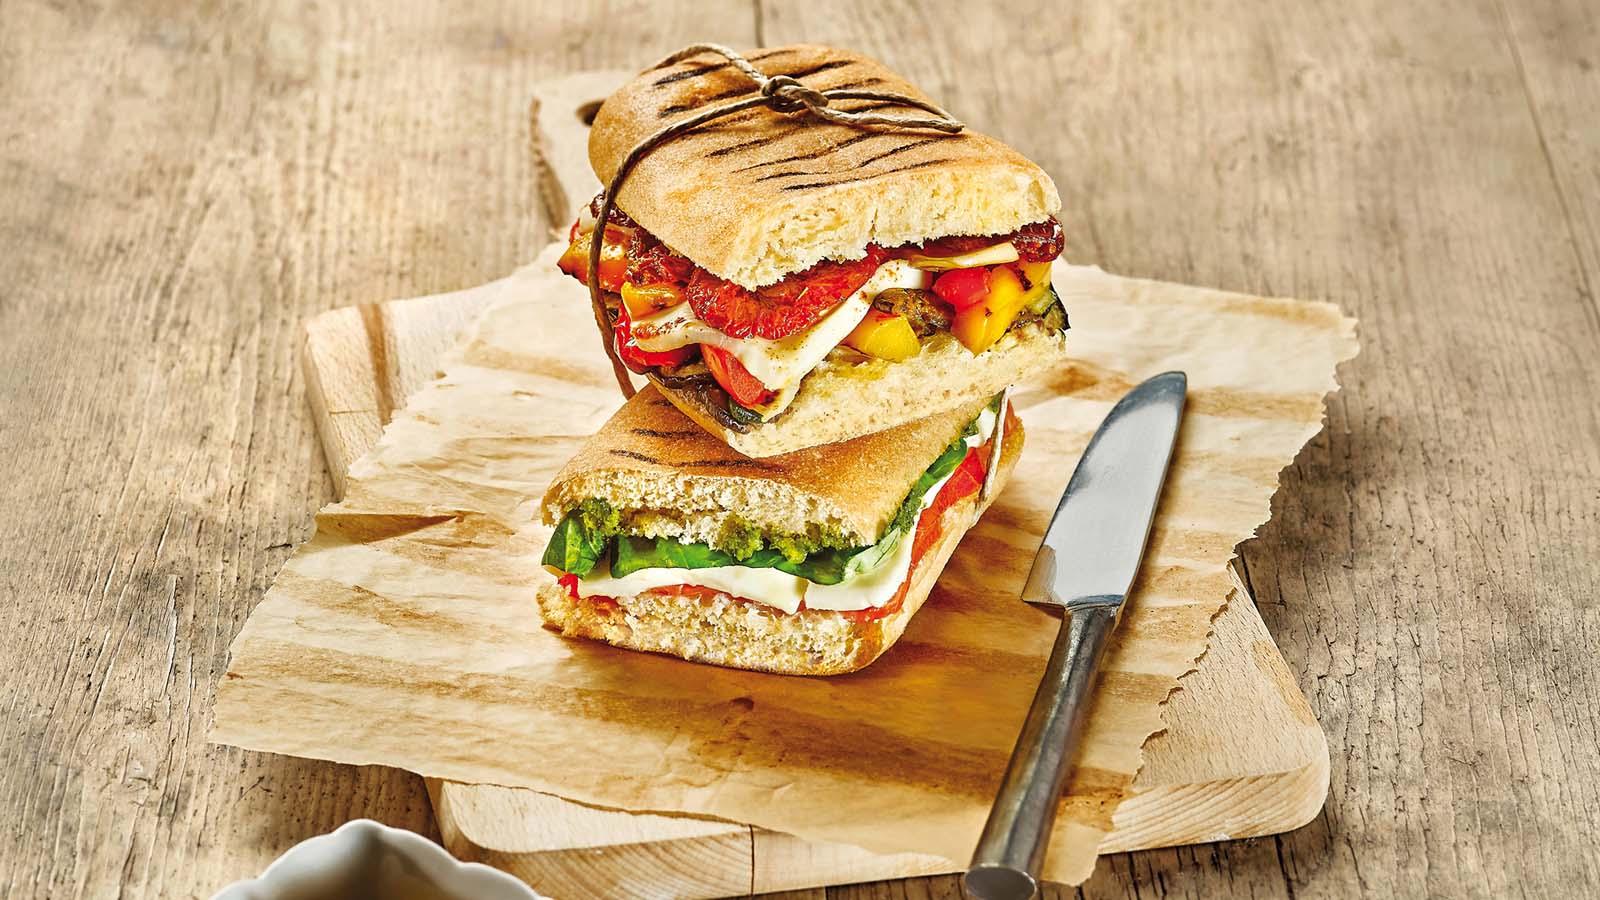 Brezglutenski panini kruhki – Panini Rolls